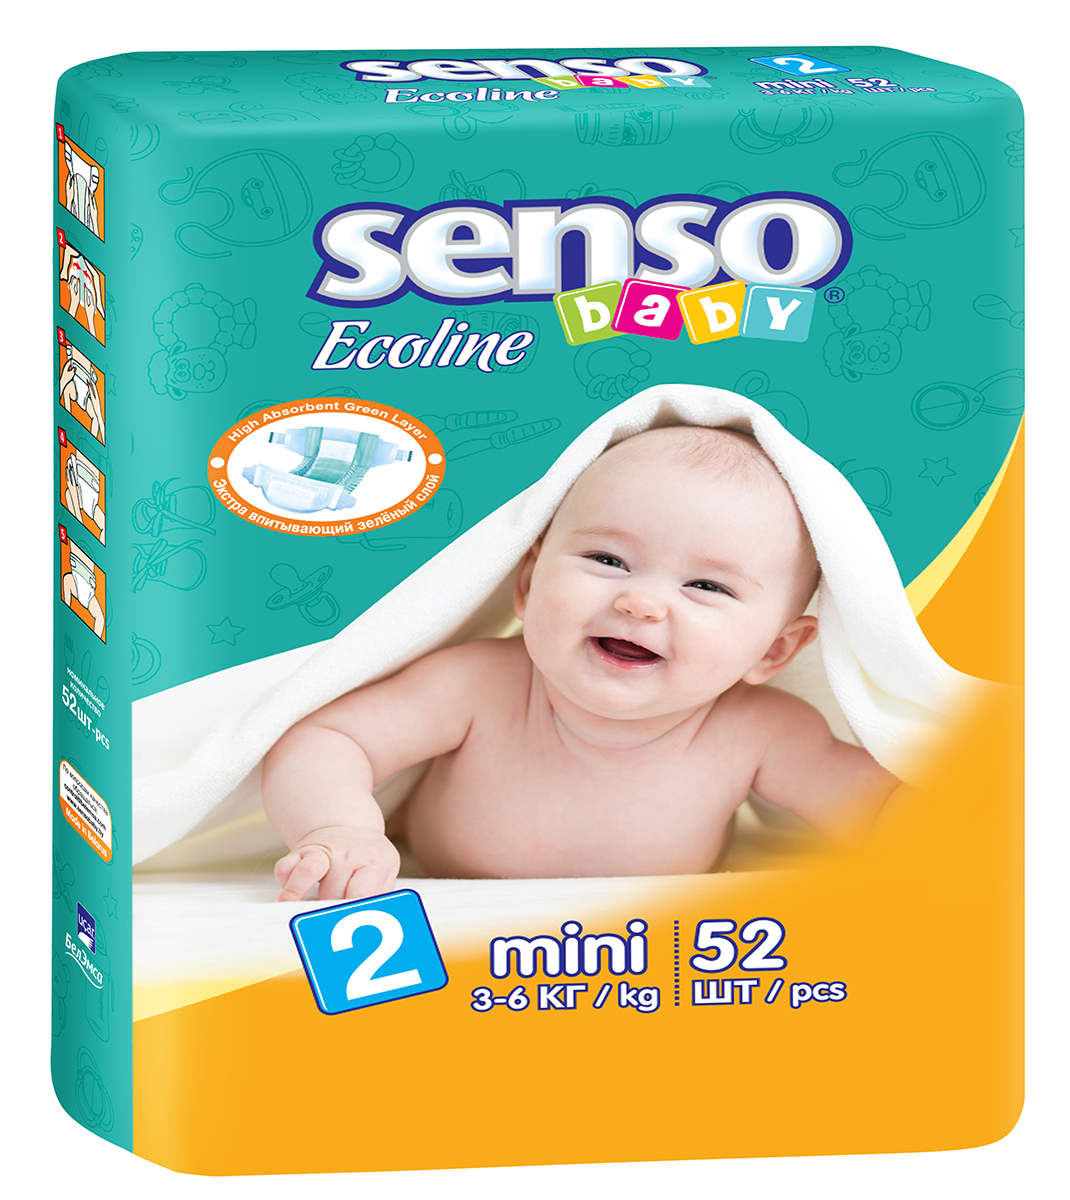 Senso Baby Ecoline Подгузники Mini 3-6 кг 52 шт onex 3d pic ecoline explore